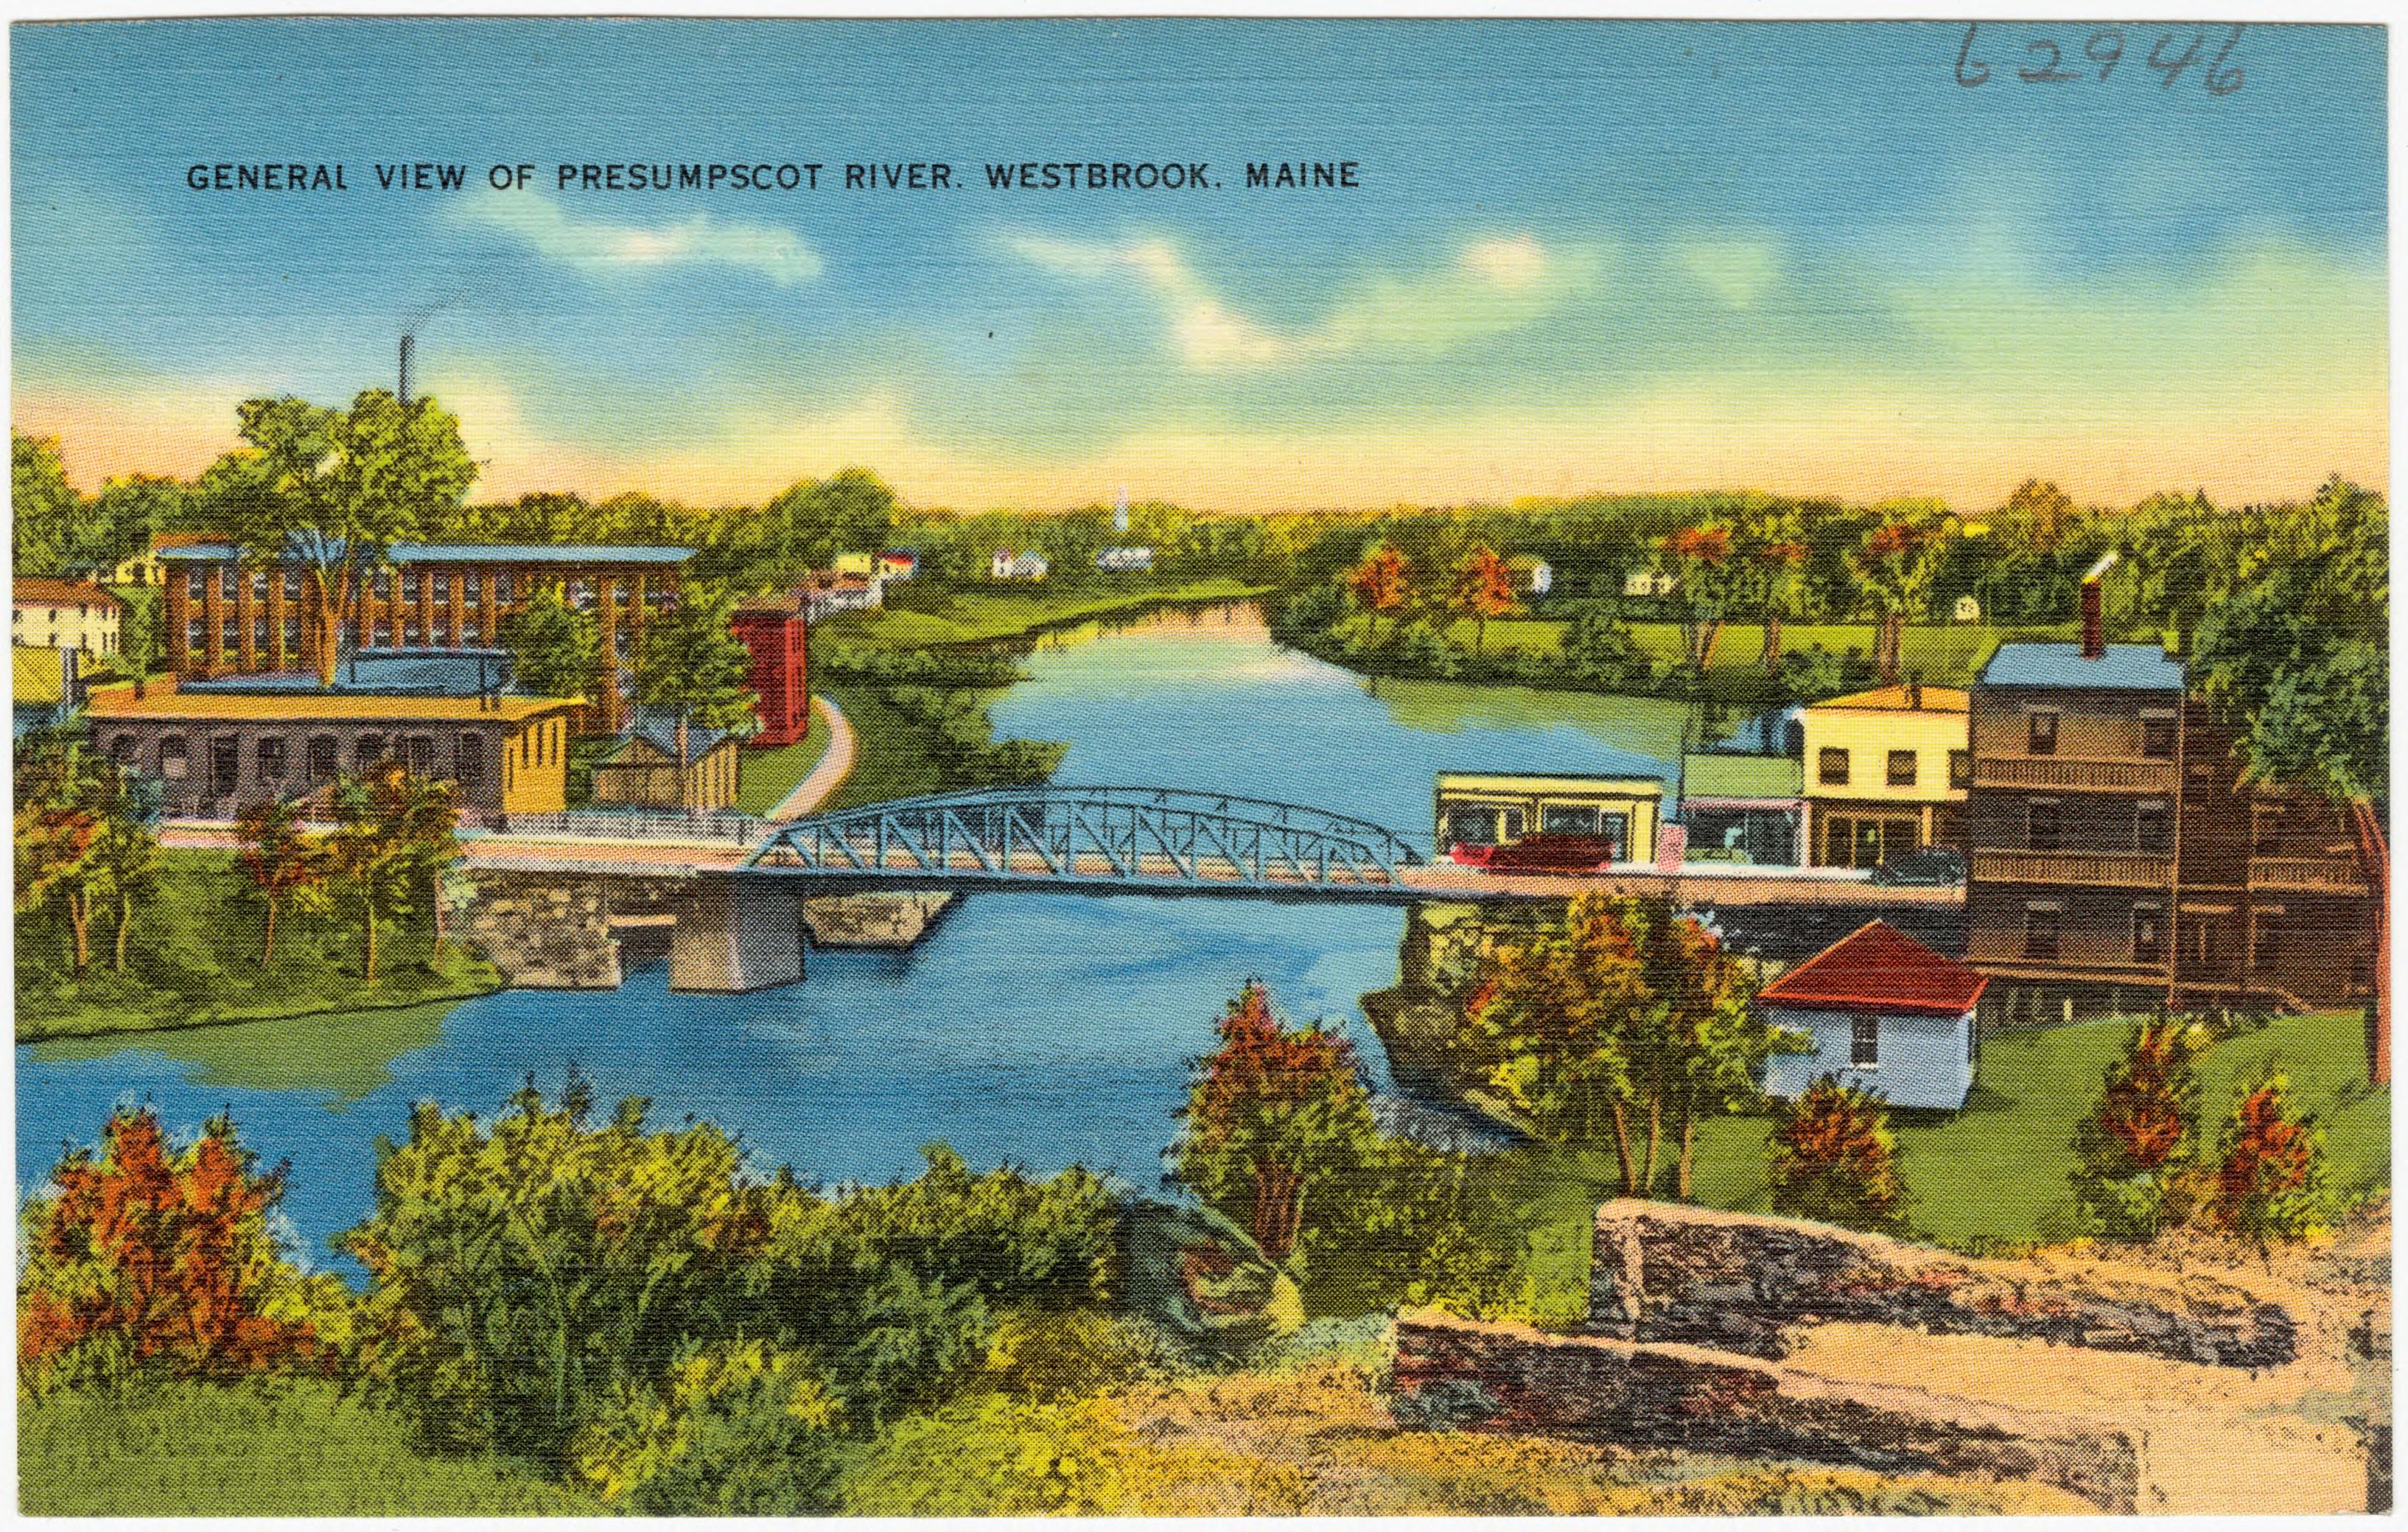 General_view_of_Presumpscot_River,_Westbrook,_Maine_(62946)